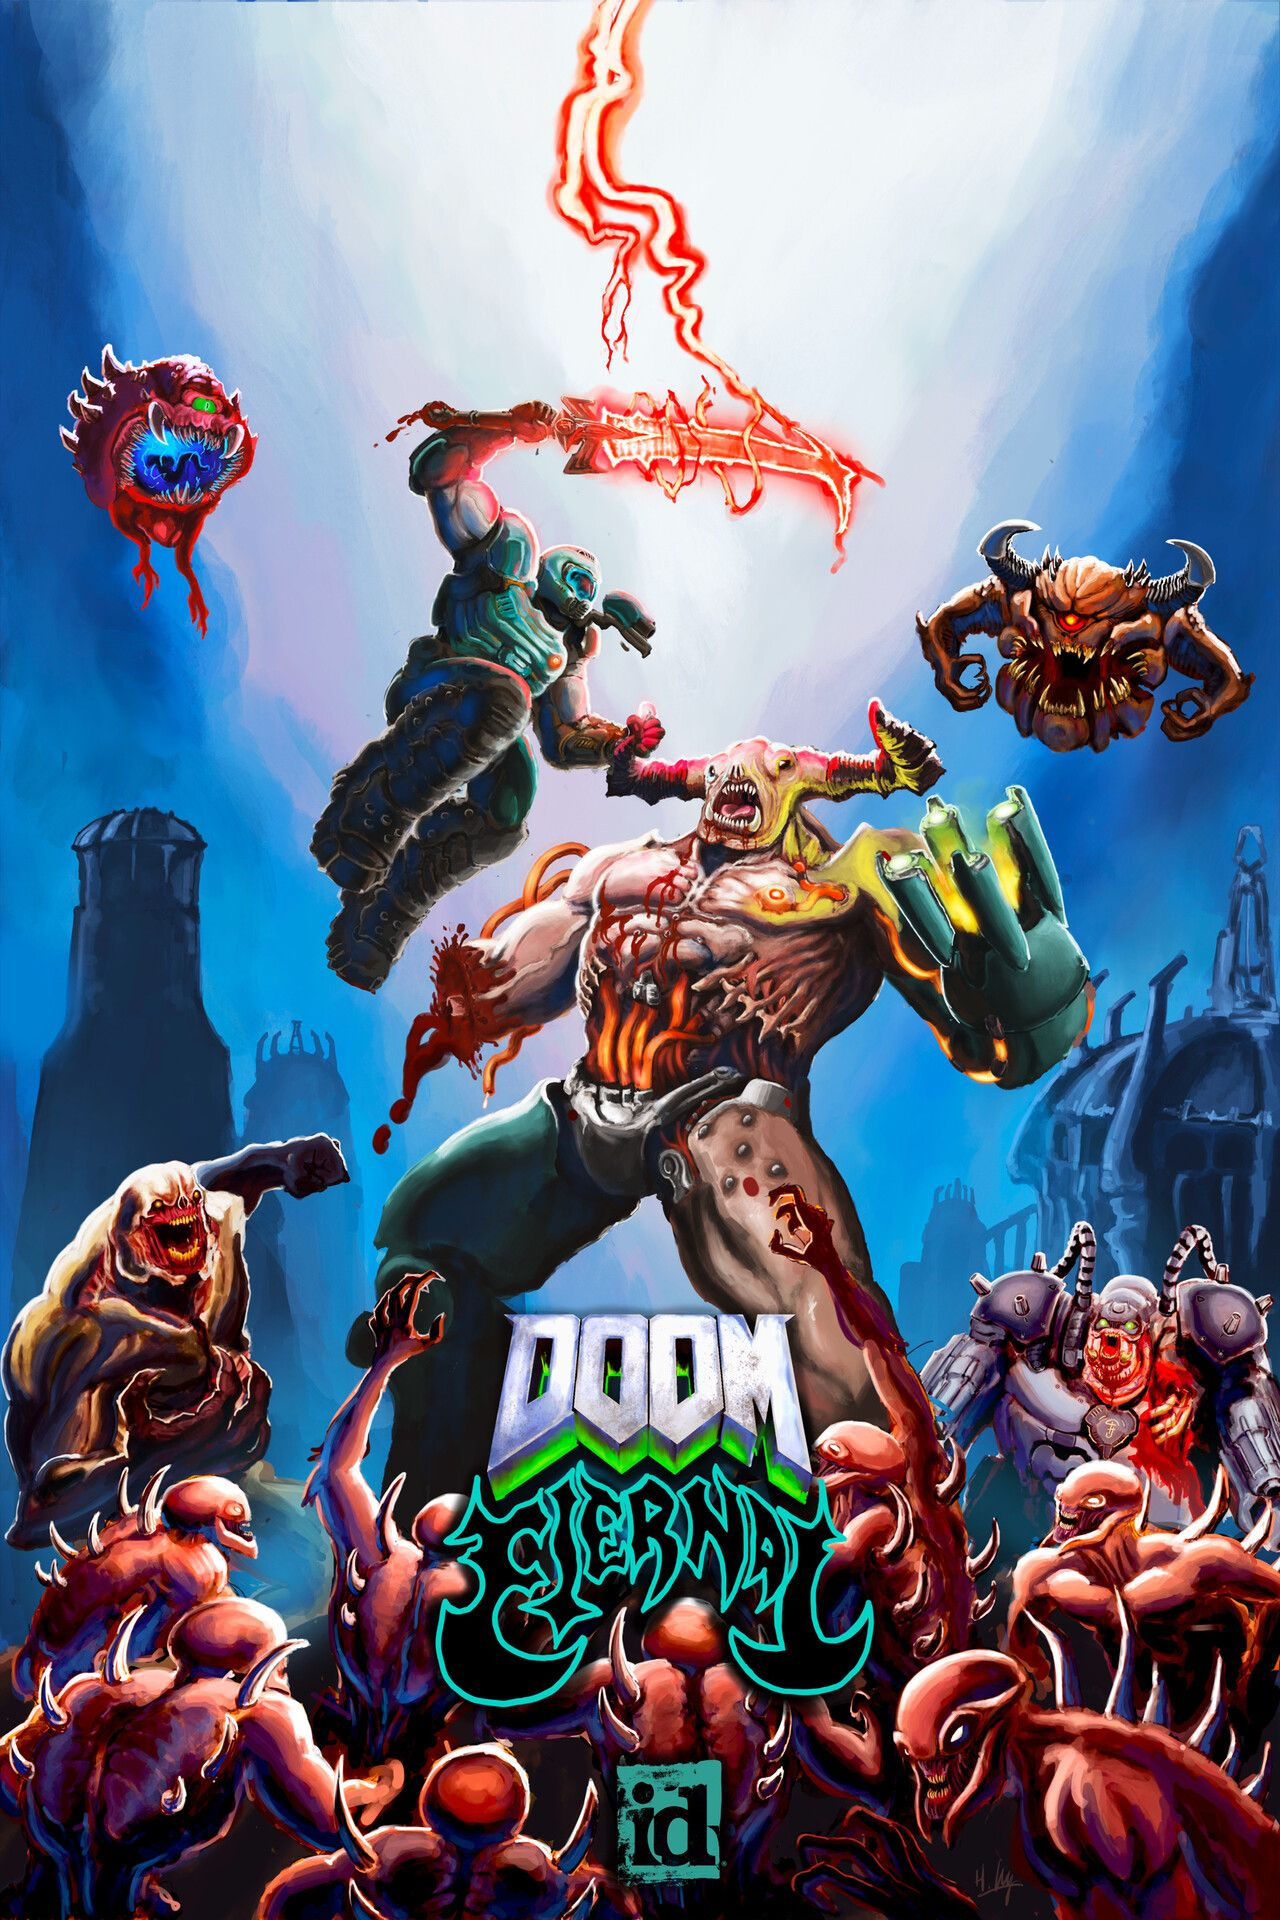 Doom Eternal Fan Art In 2020 Doom 1993 Doom Slayer Meme